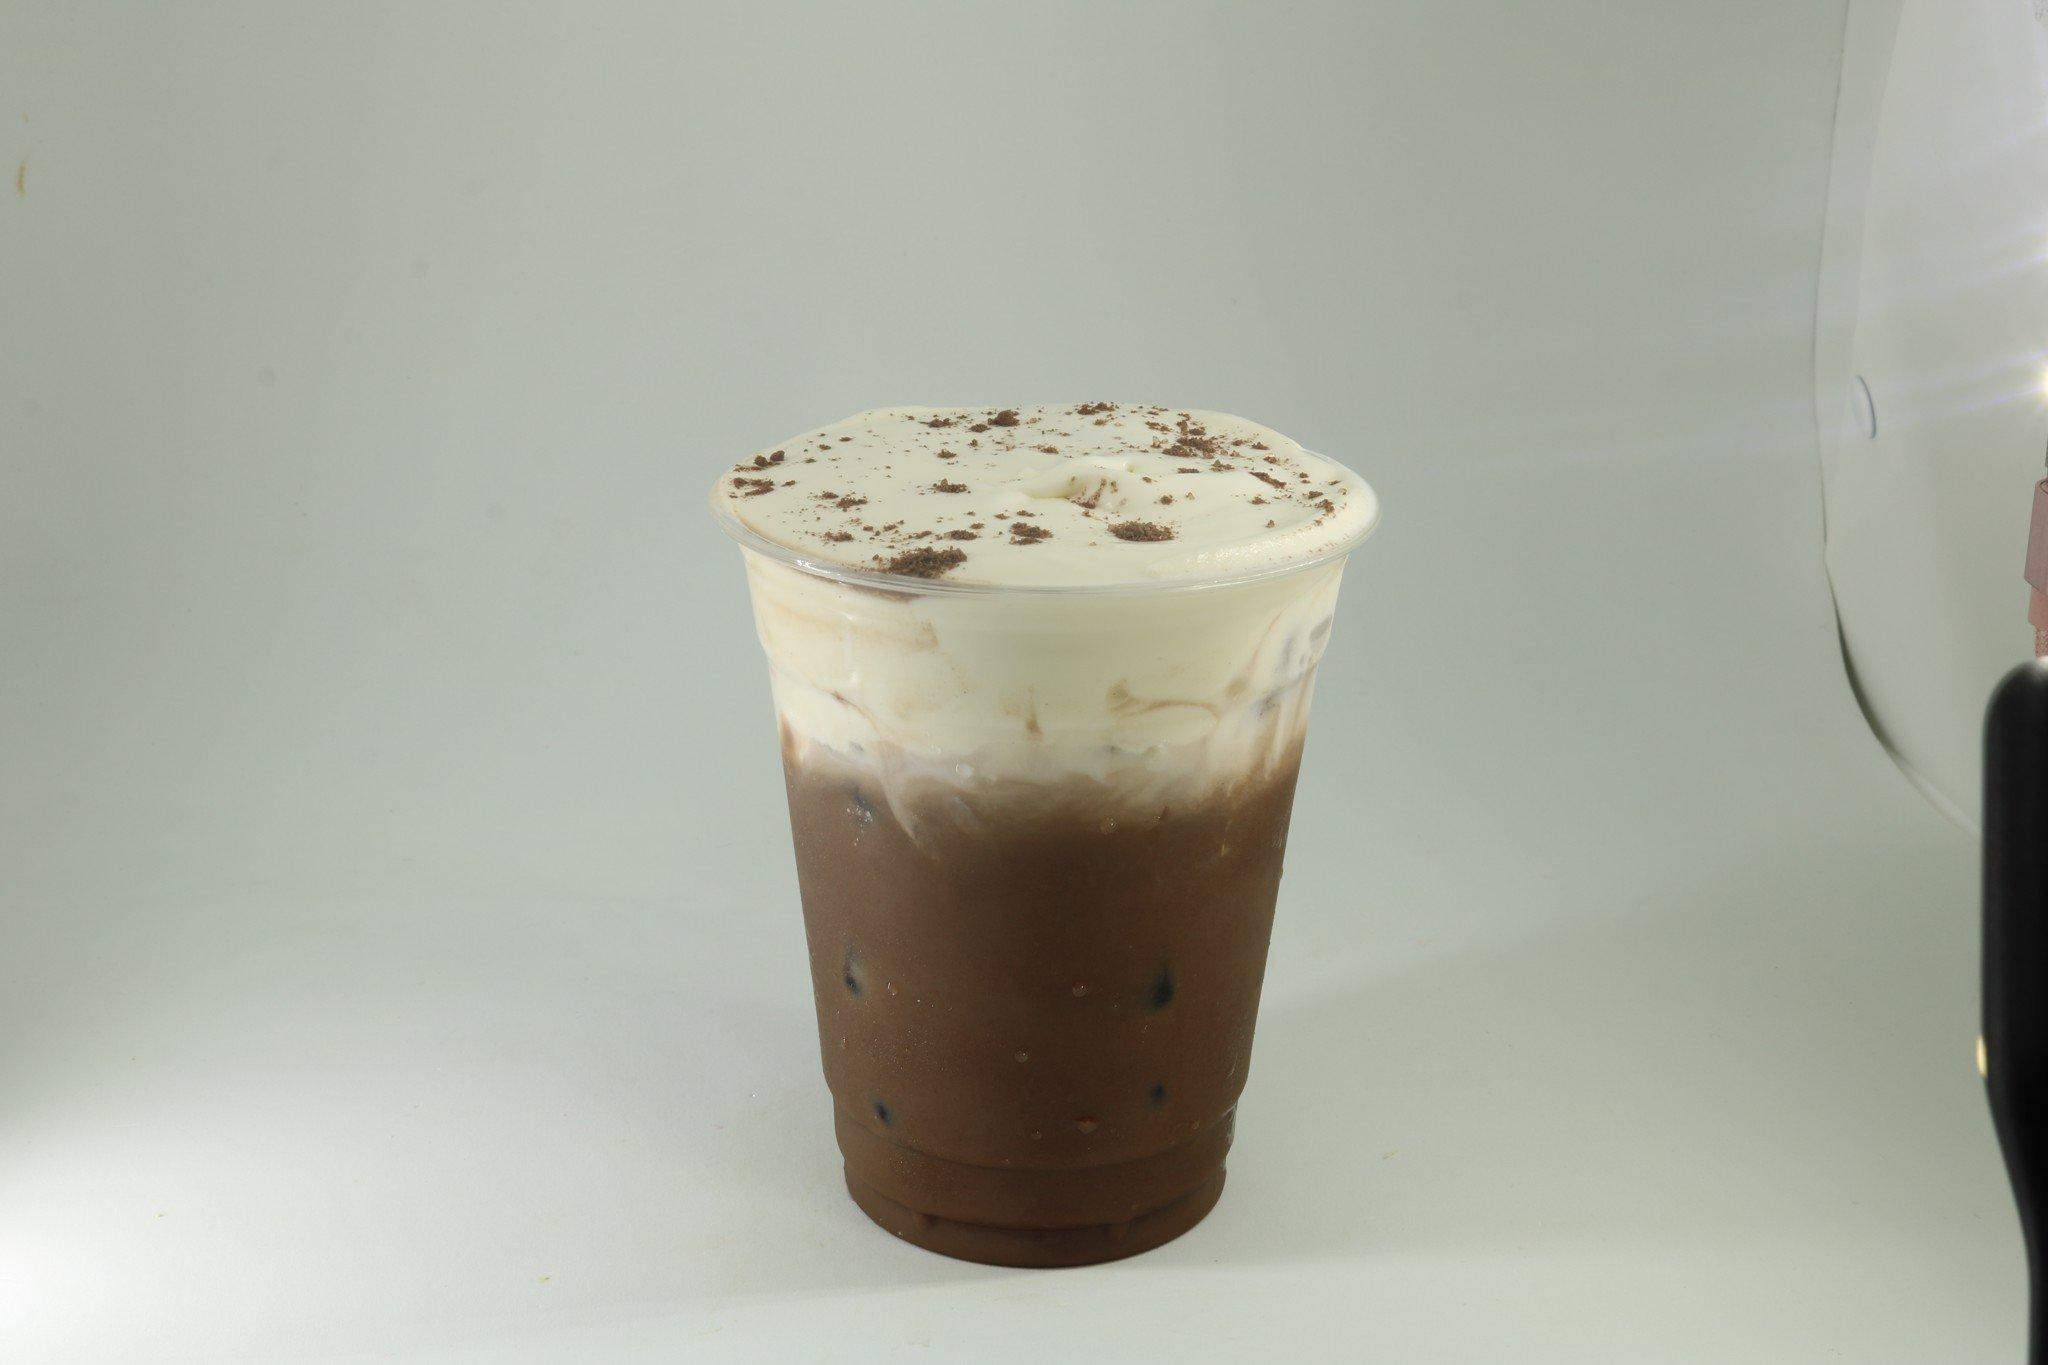 10. Cacao sữa milk foam